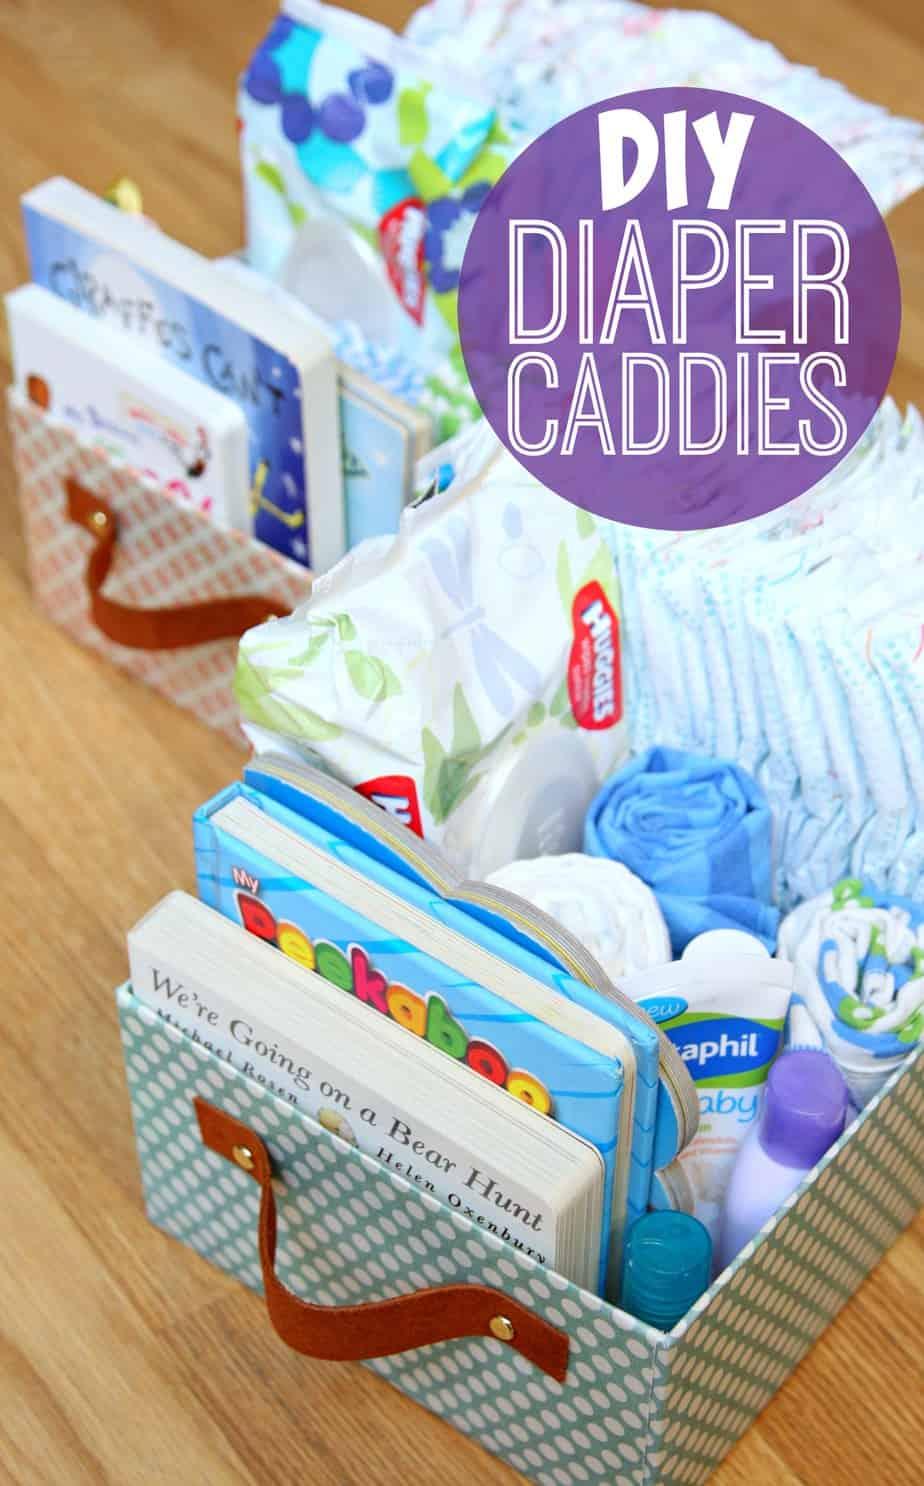 DIY Diaper Caddies